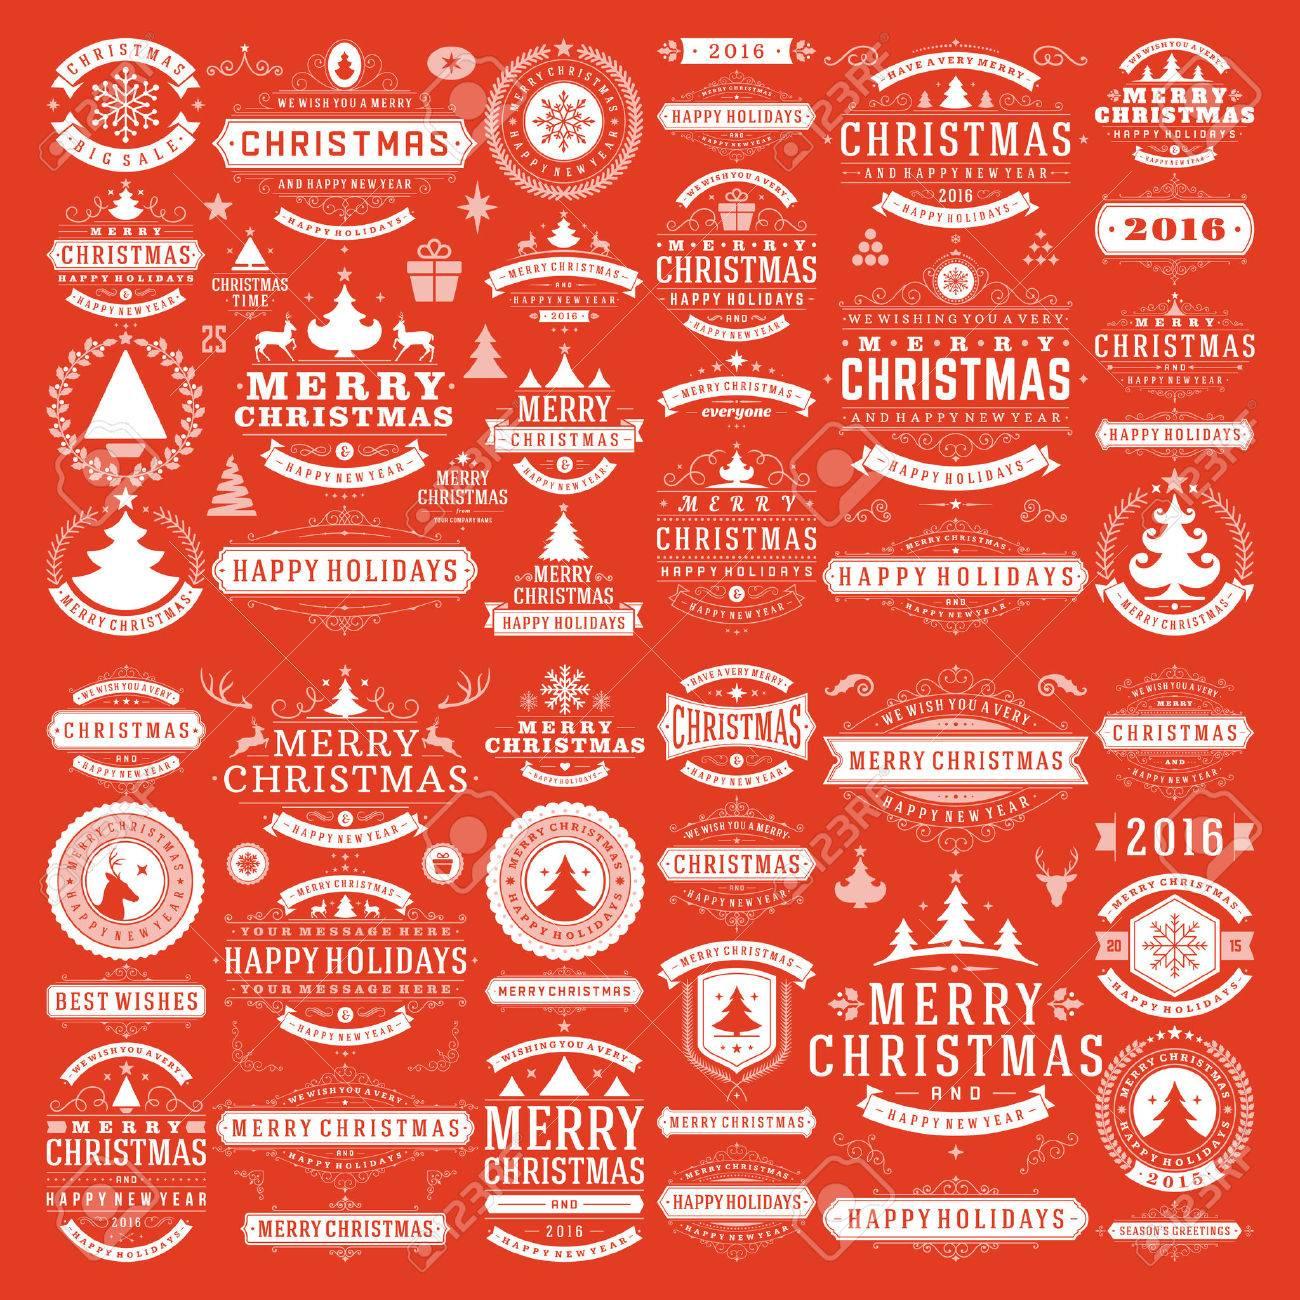 Christmas decorations vector design elements. Typographic messages, vintage labels, frames ribbons, badges, ornaments set. Flourishes calligraphic. Big Collection. - 47410144